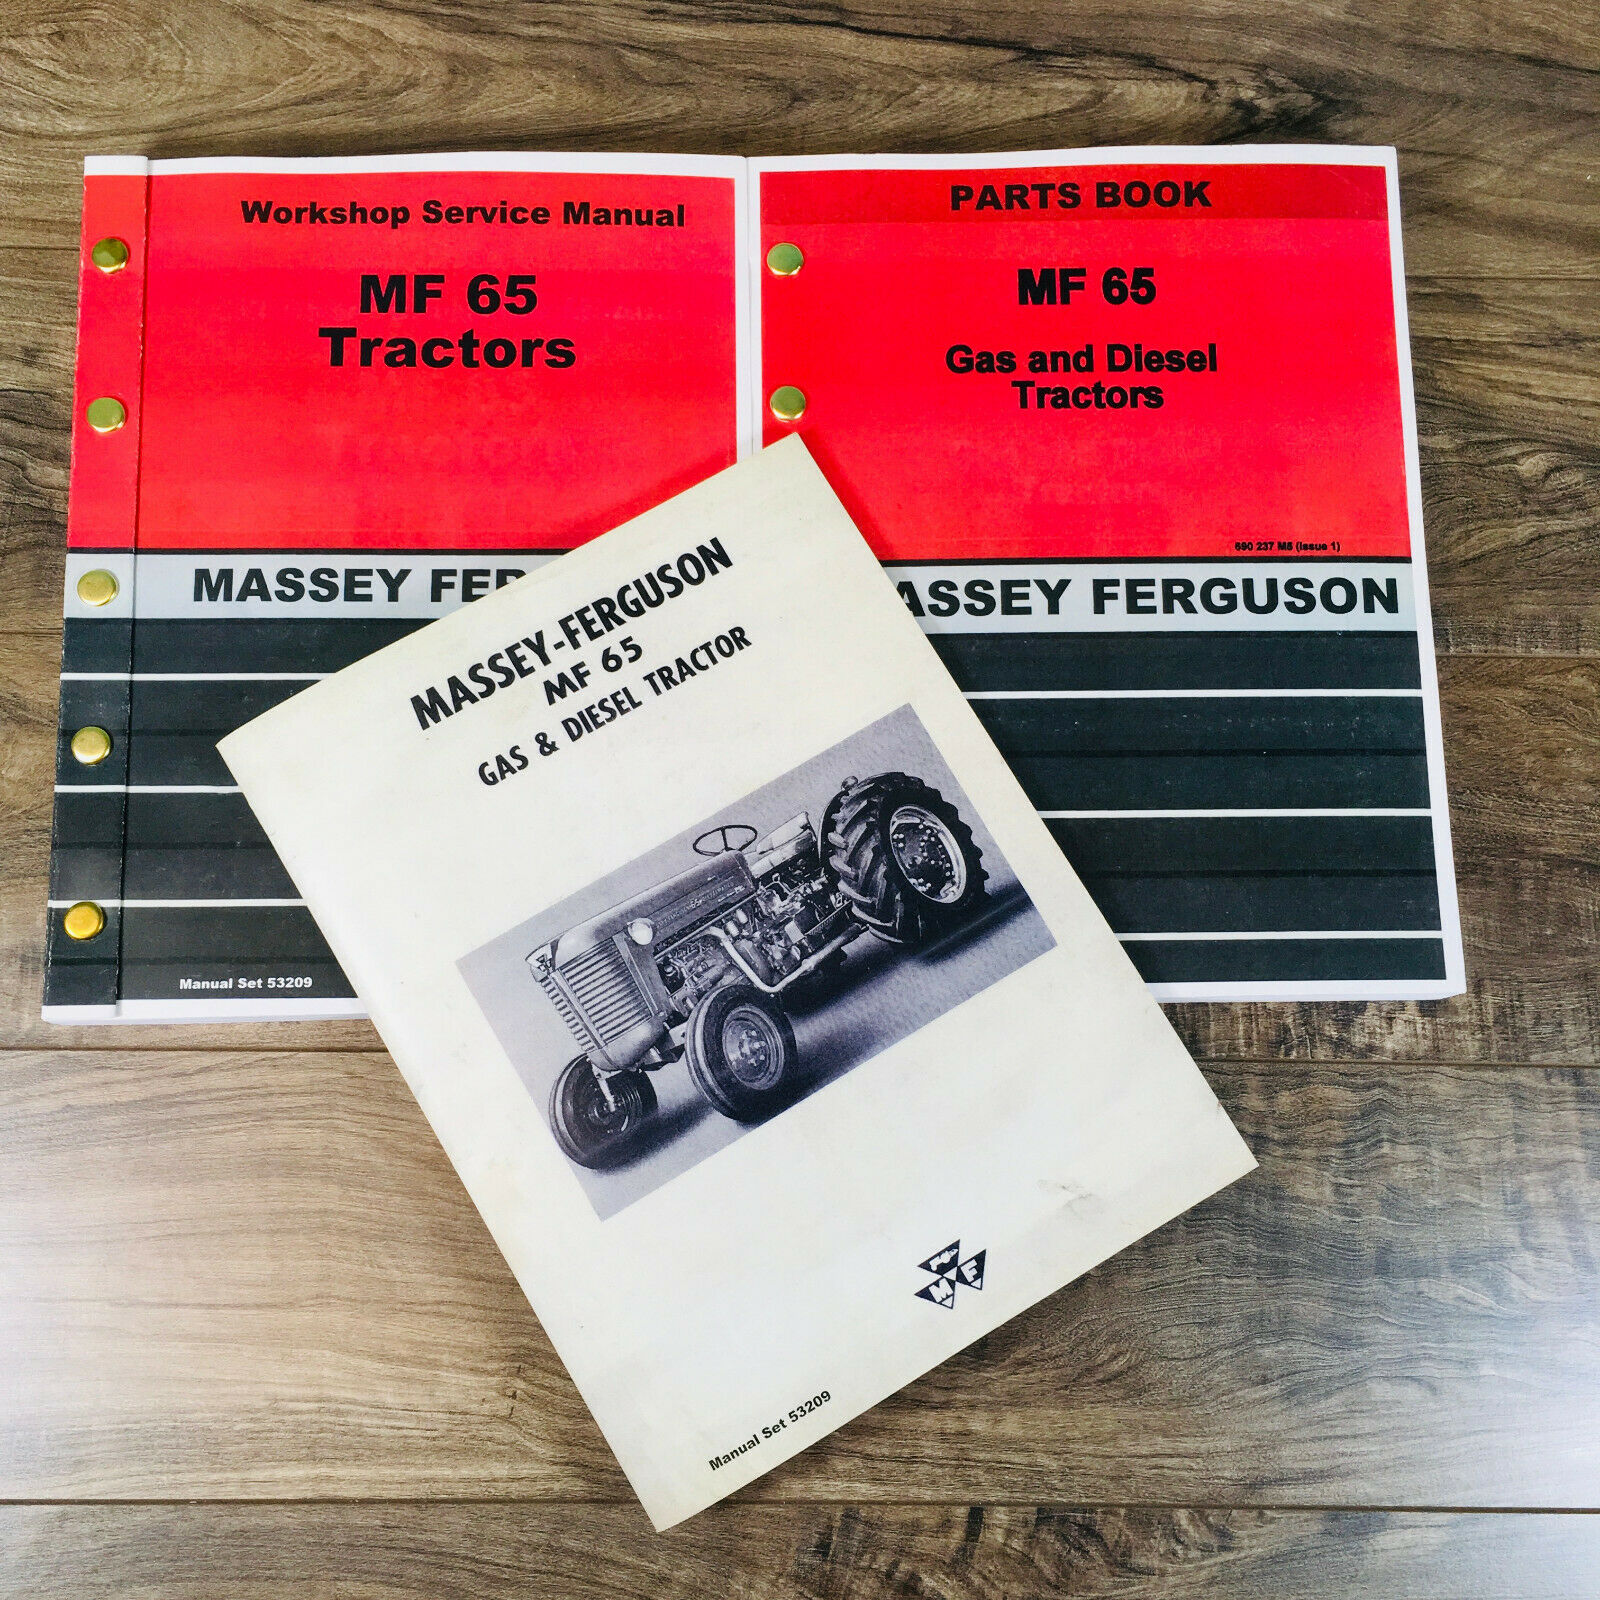 Set Massey Ferguson 65 Tractor Service Parts Catalog Operators Manual Shop Book Ebay